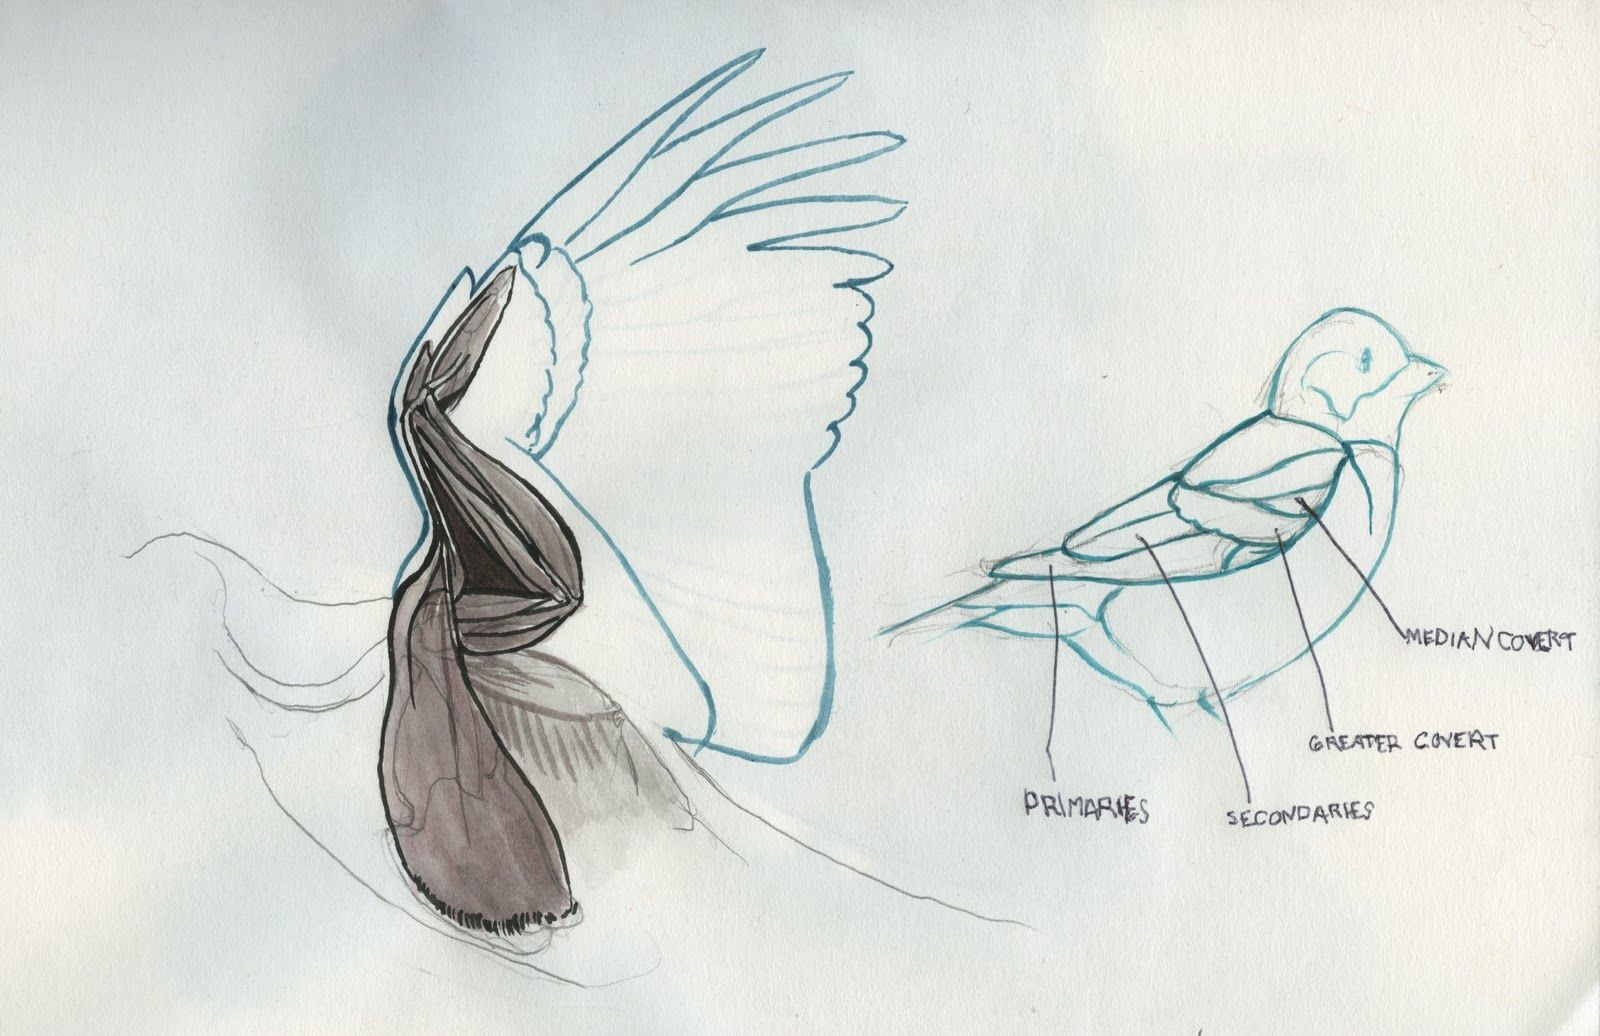 Eagle muscle anatomy